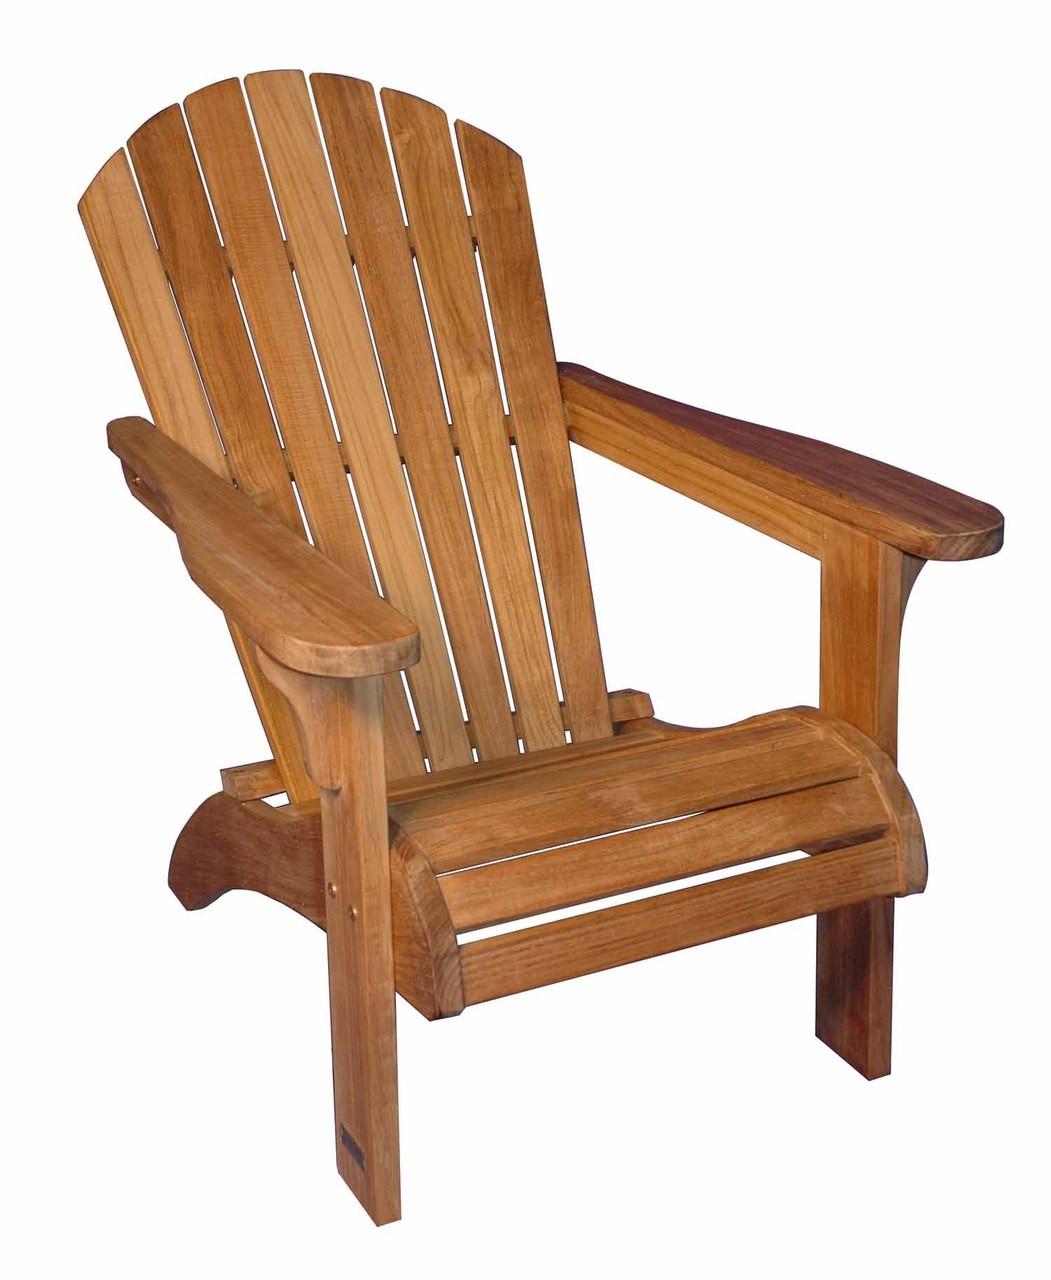 Teak Furniture Adirondack Chair Solid Teak